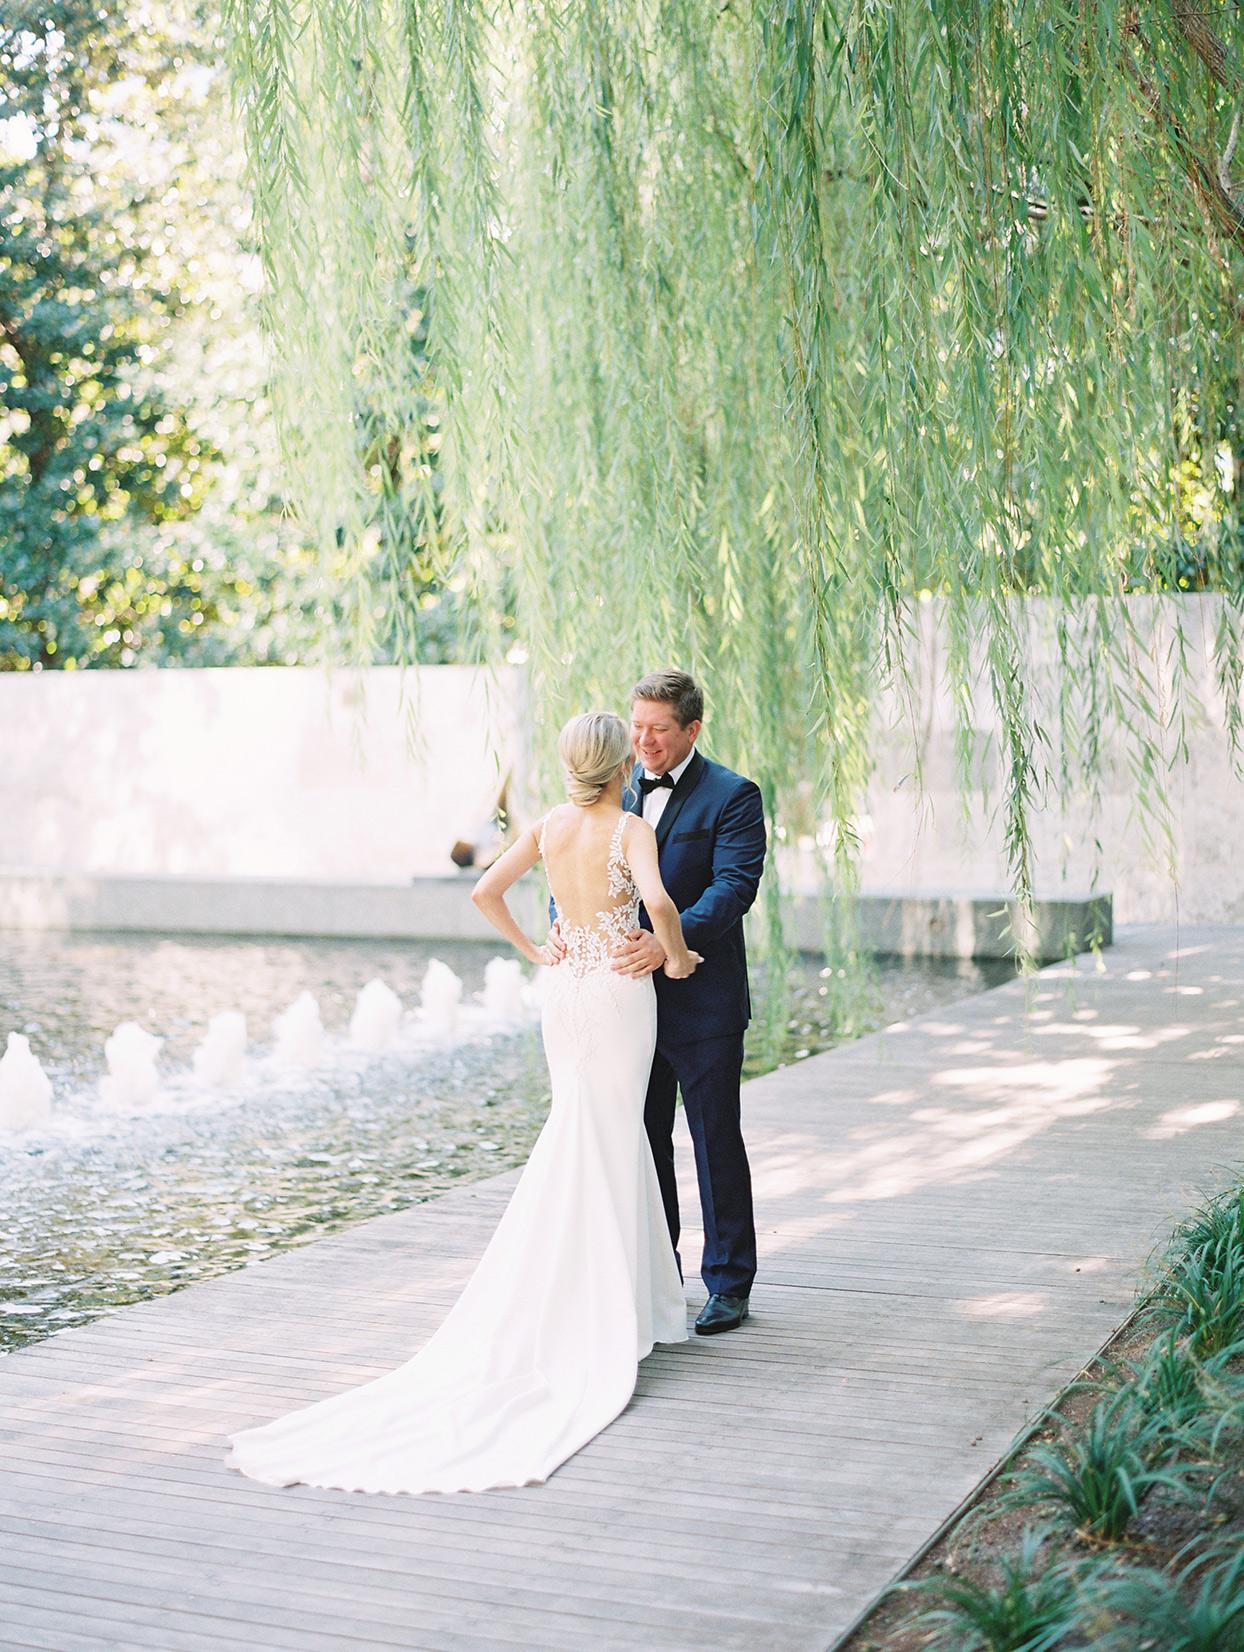 wedding couple first look on boardwalk under willow tree